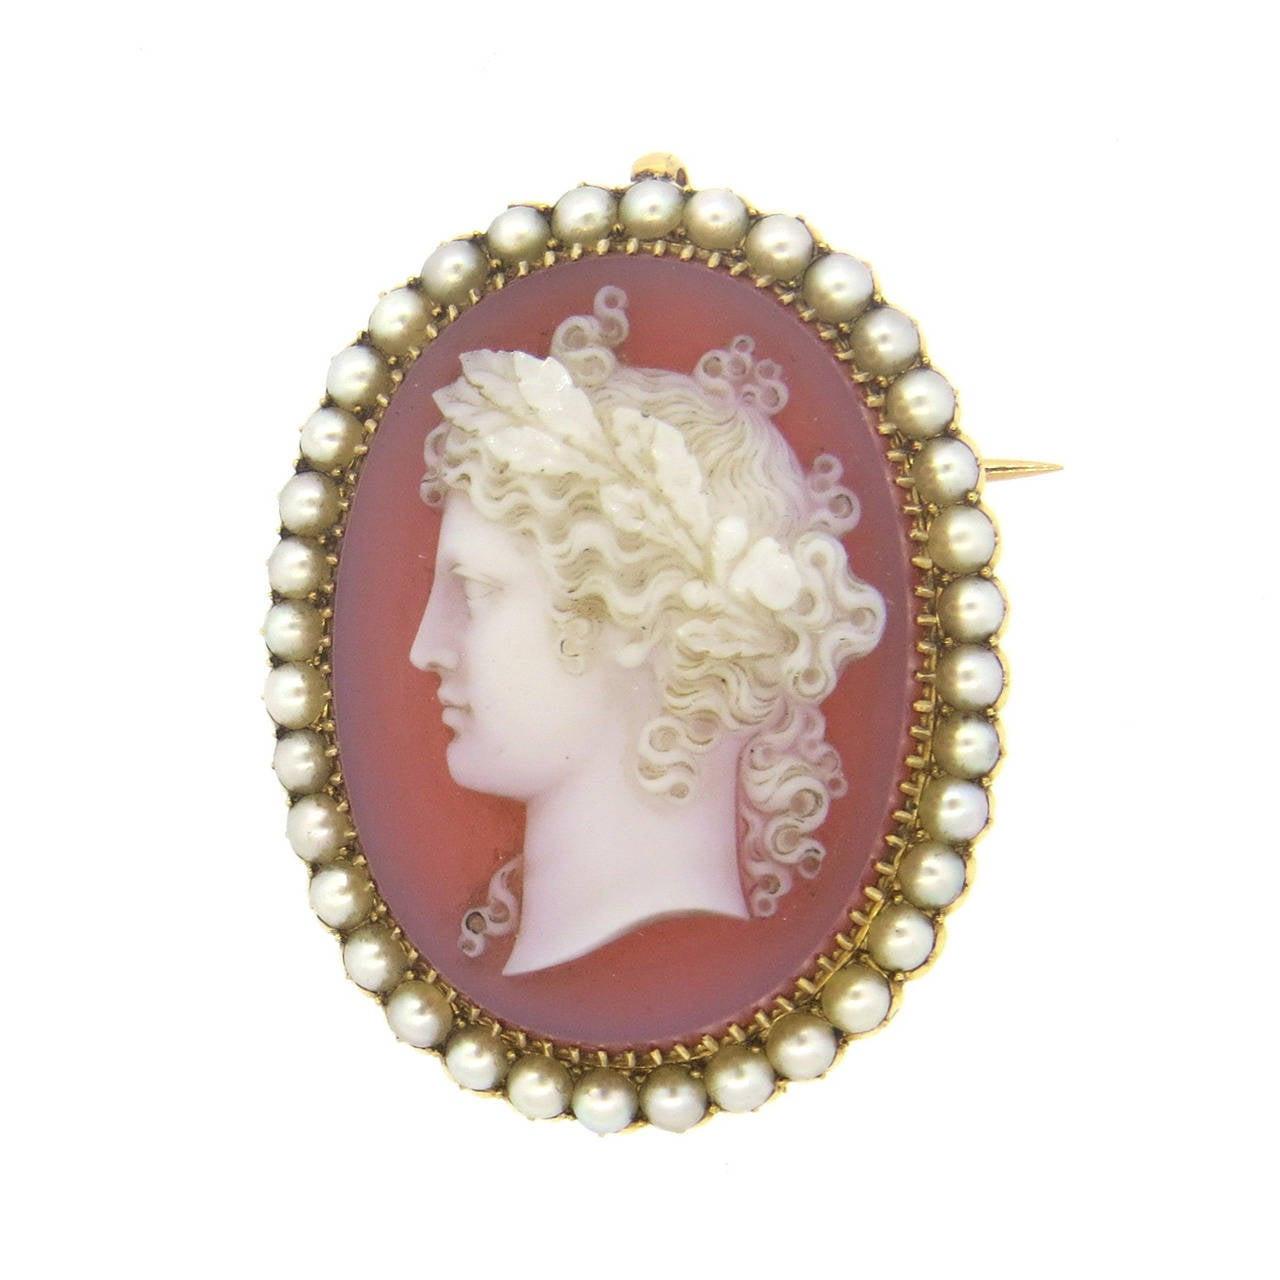 Cameo Brooches  Impressive Antique Pearl Hard Stone Cameo Brooch Pendant